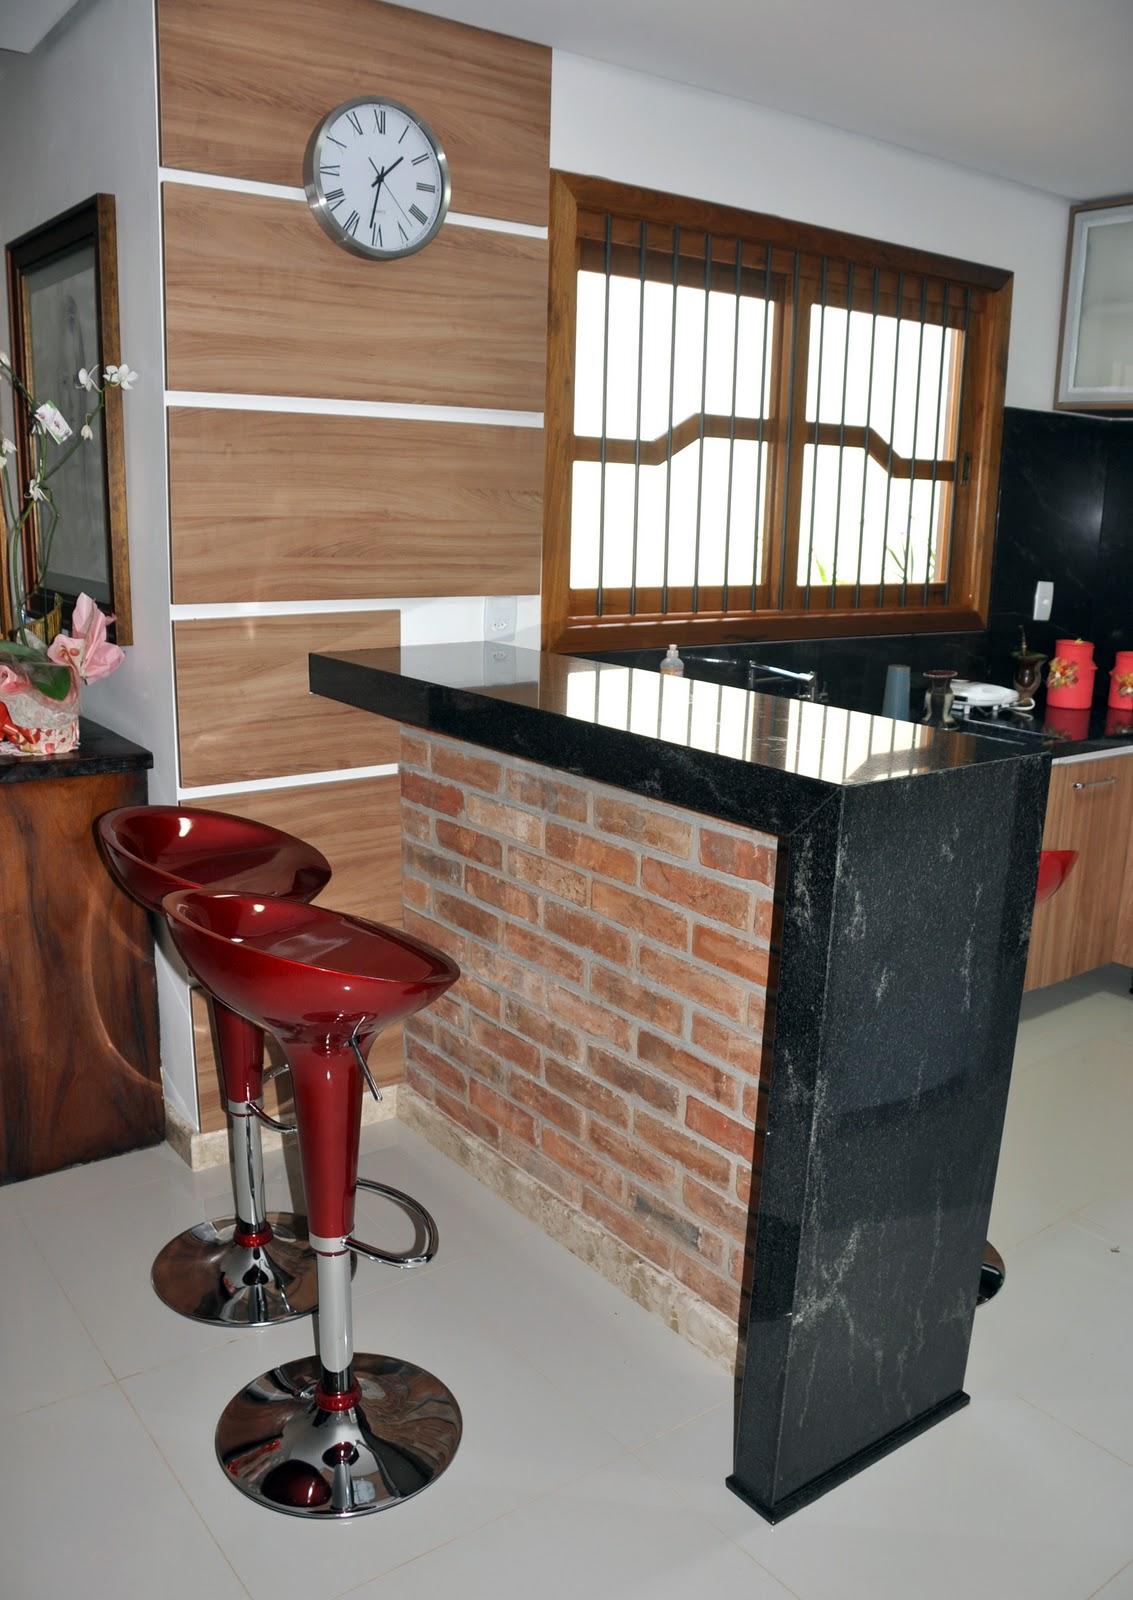 Cozinha de Granito e Bancada em granito Black Star Marmoraria MPK #6C3828 1133 1600